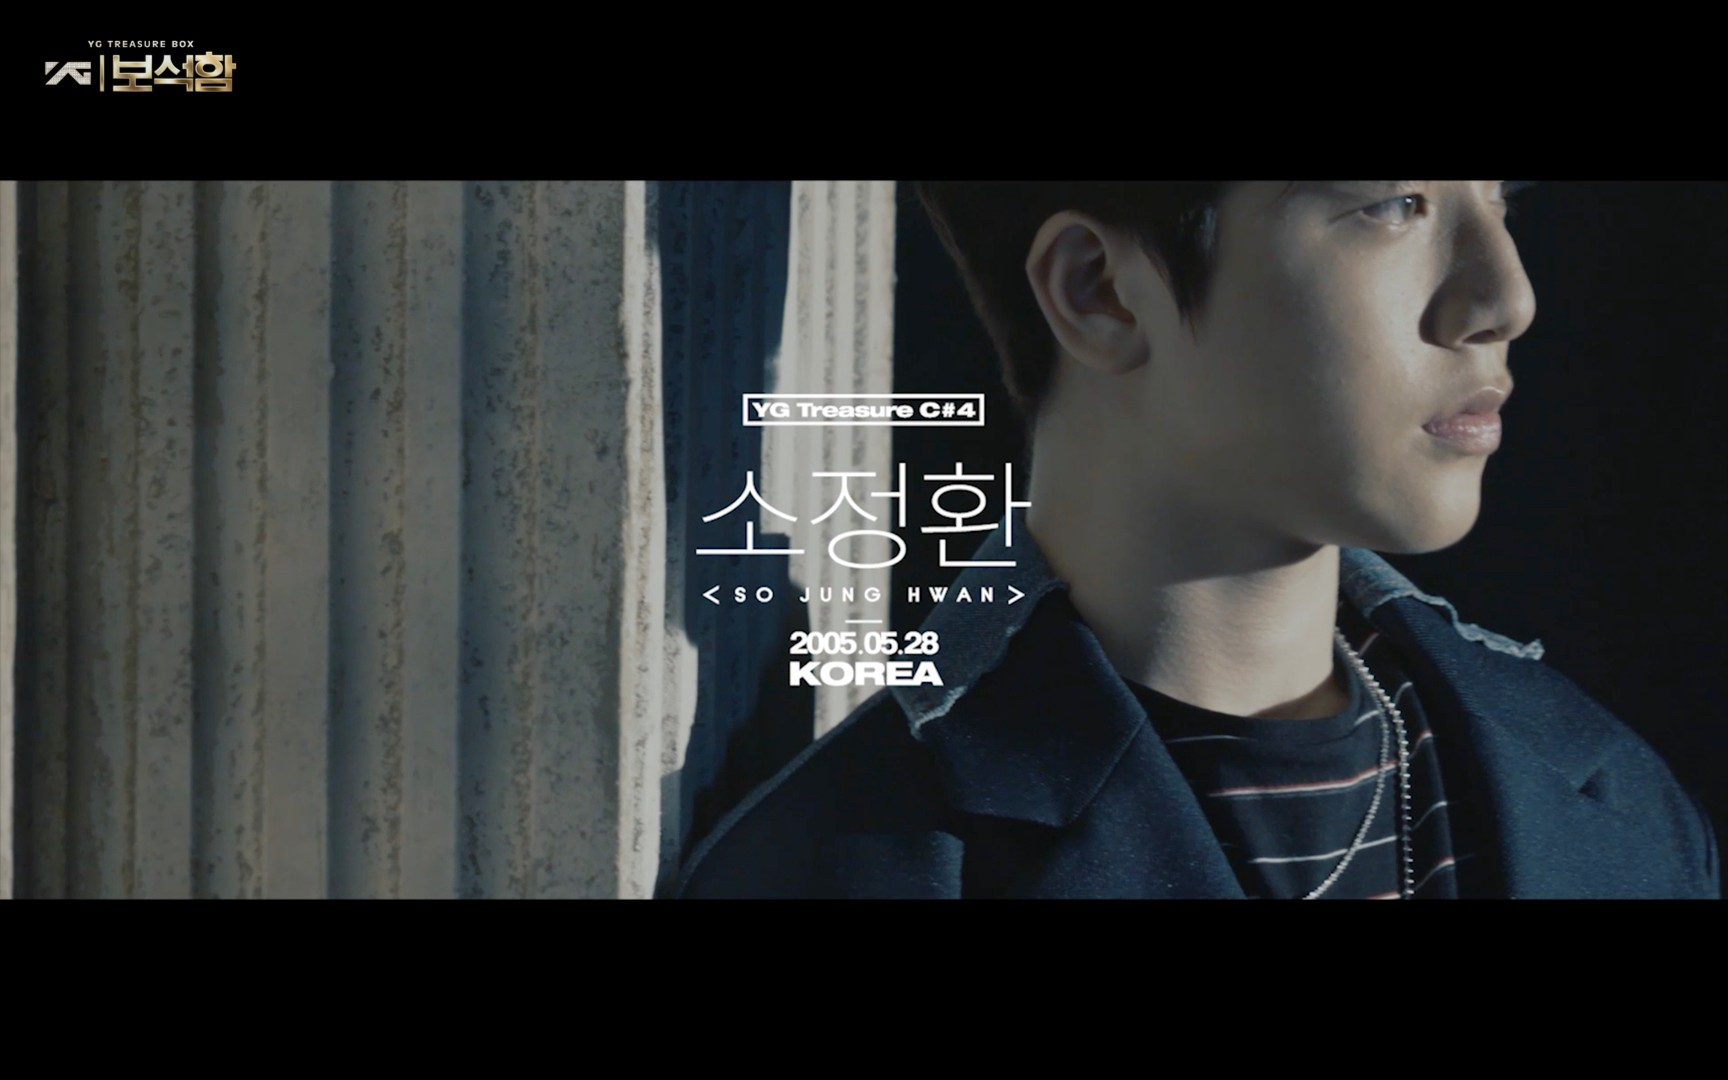 YG보석함ㅣC#4 소정환 <SO JUNGHWAN> #인터뷰+퍼포먼스